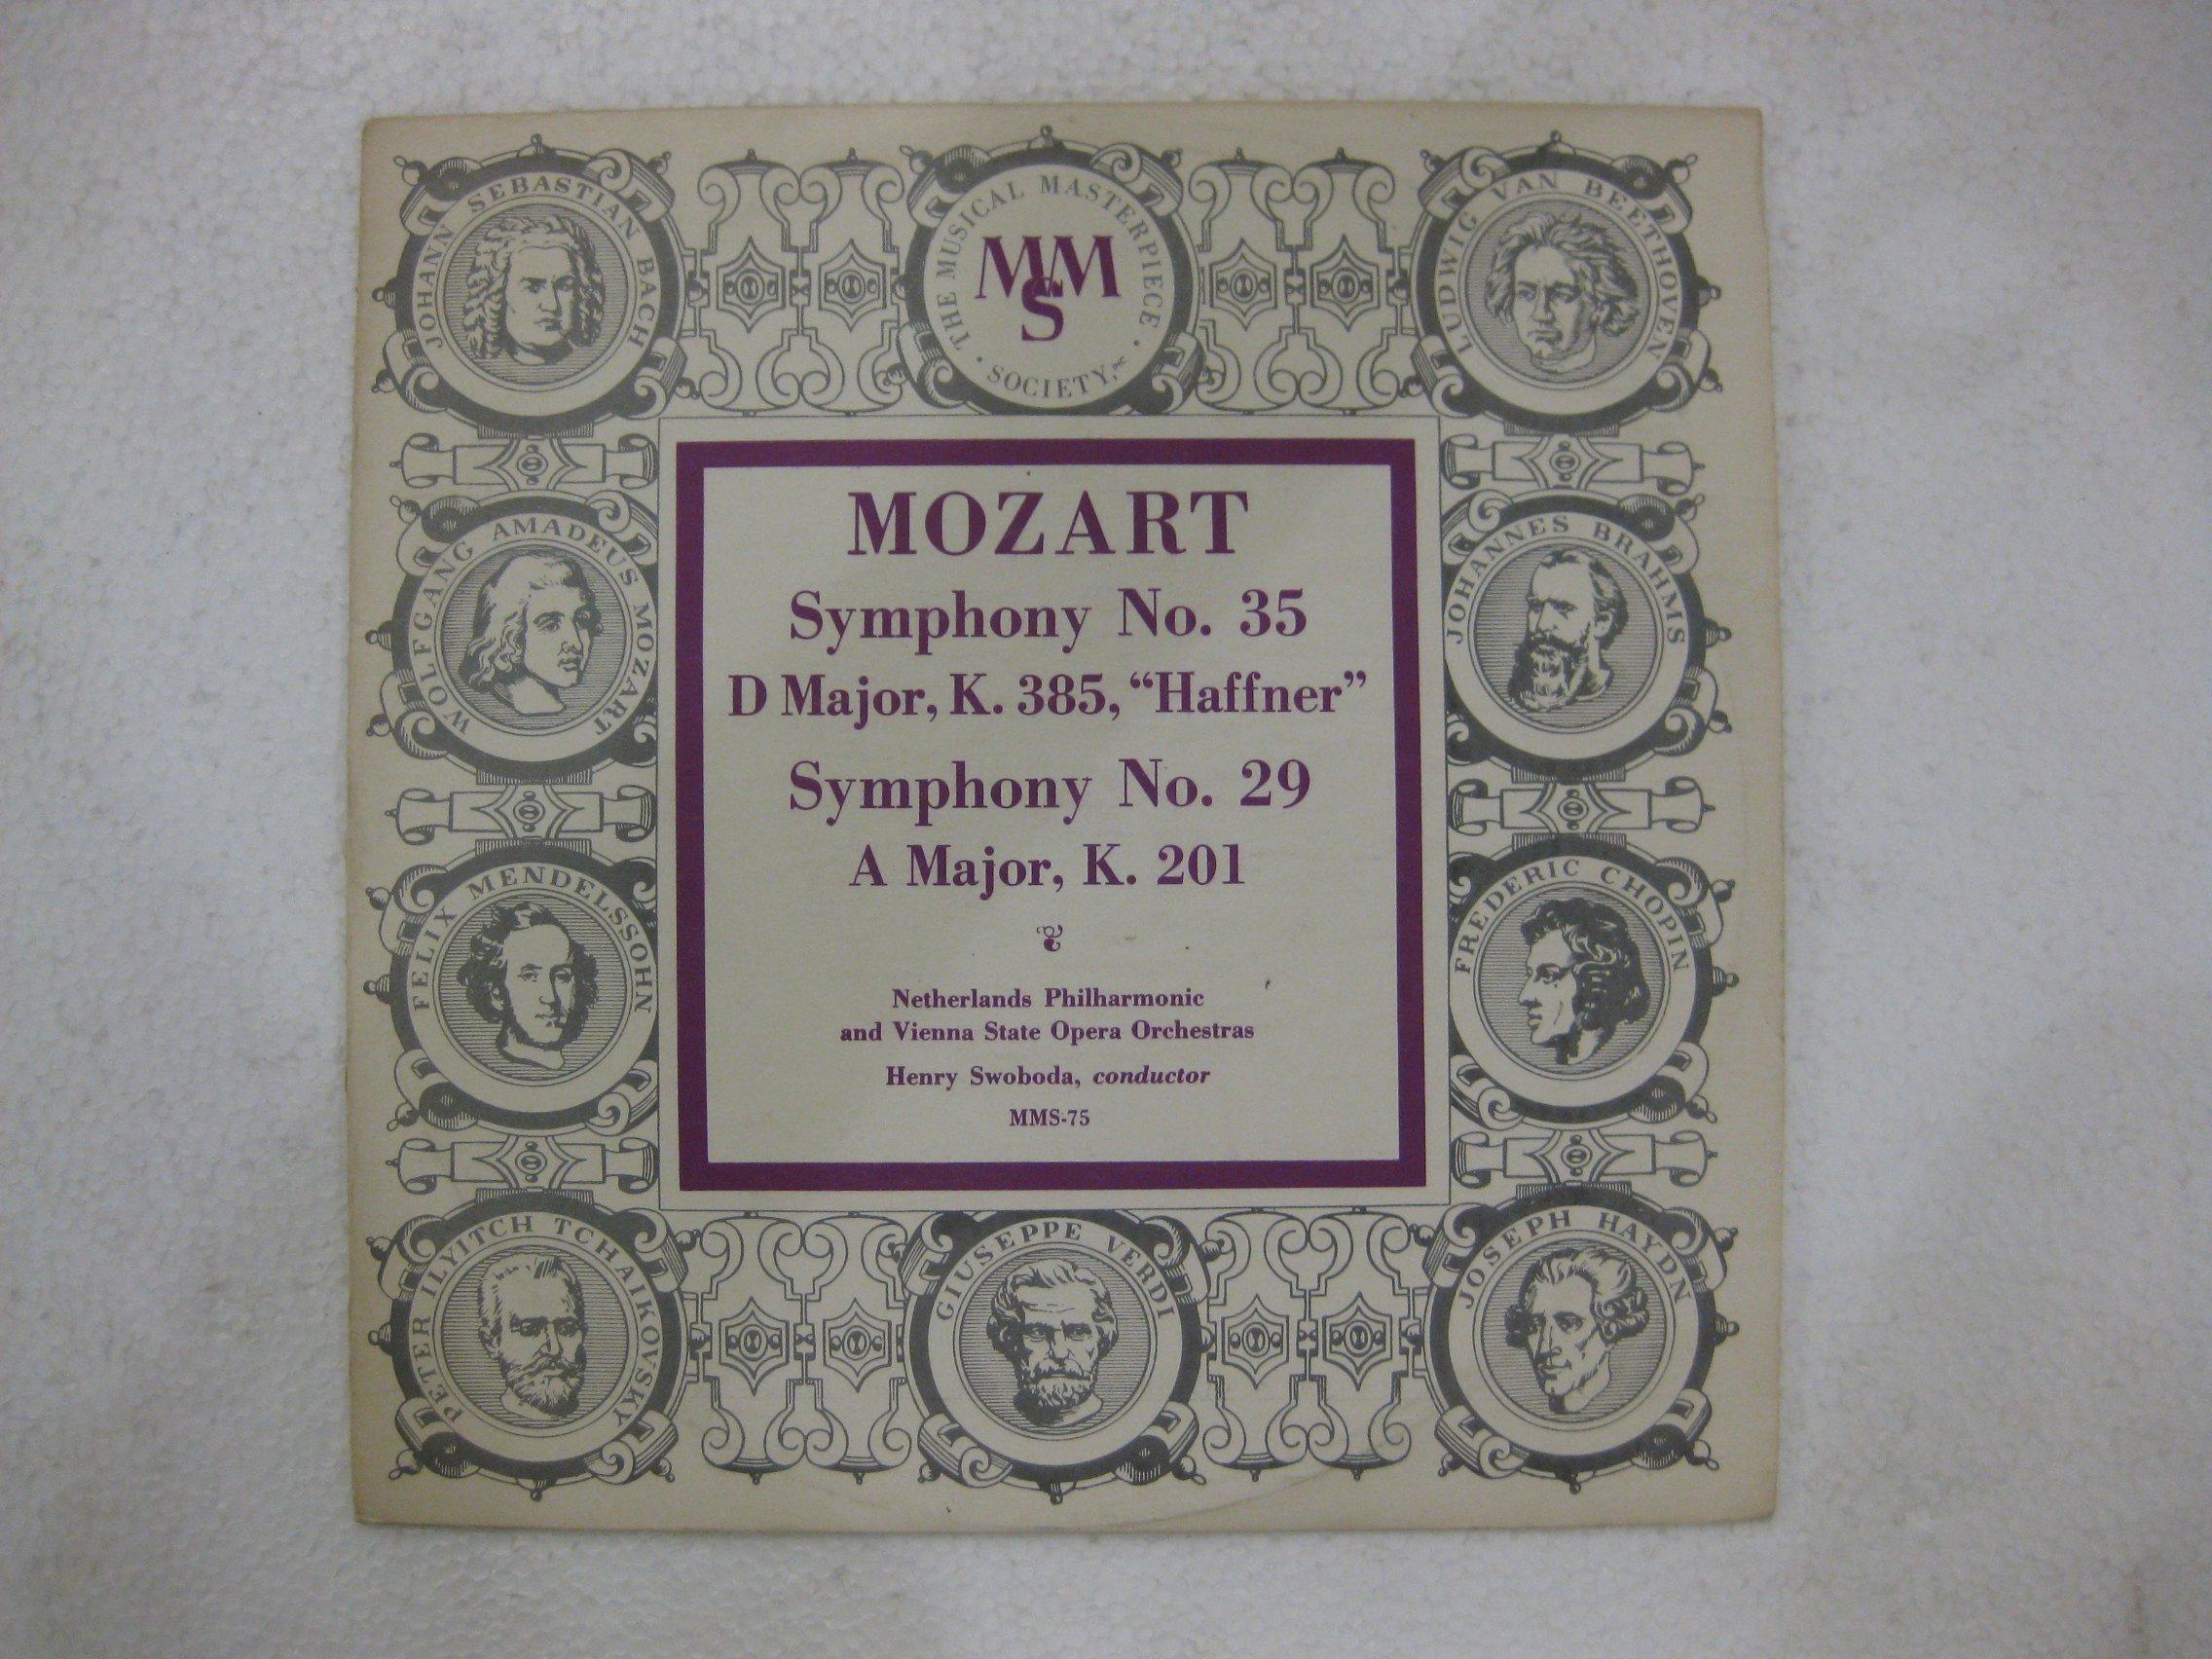 Mozart Symphony No. 35 Symphony No. 29 10 Inch Vinyl